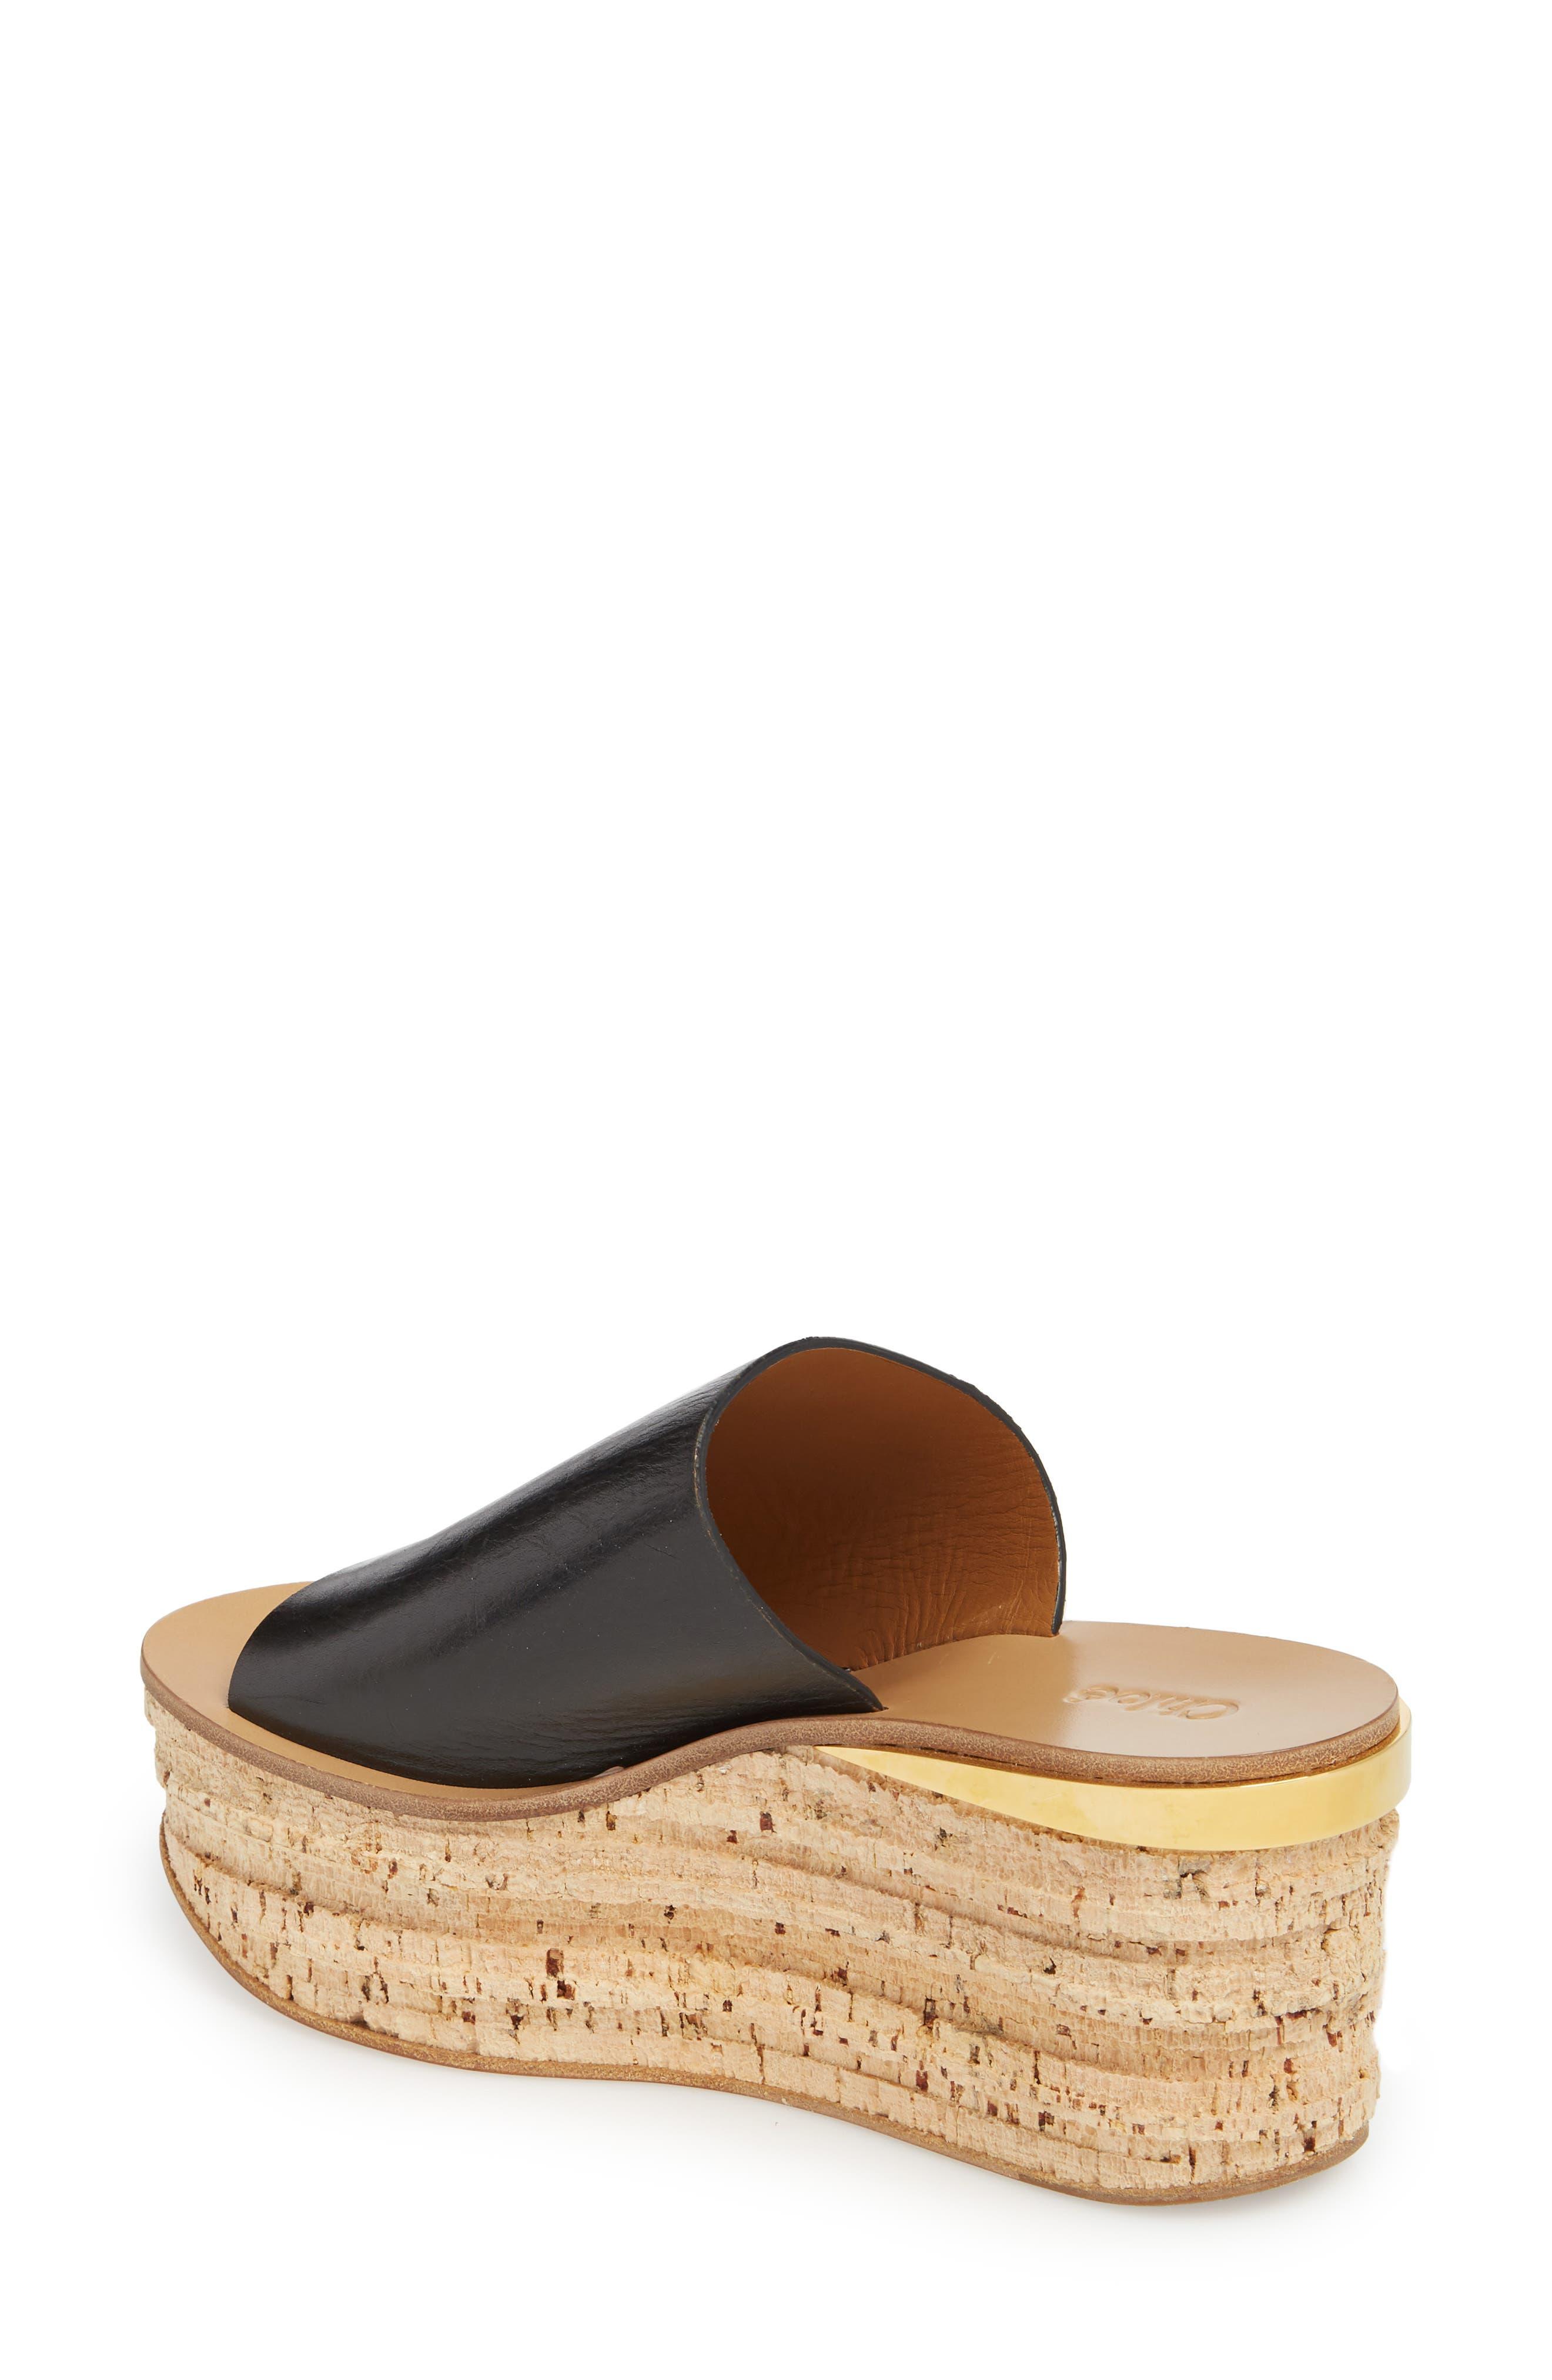 CHLOÉ, Camille Cork Platform Sandal, Alternate thumbnail 2, color, BLACK